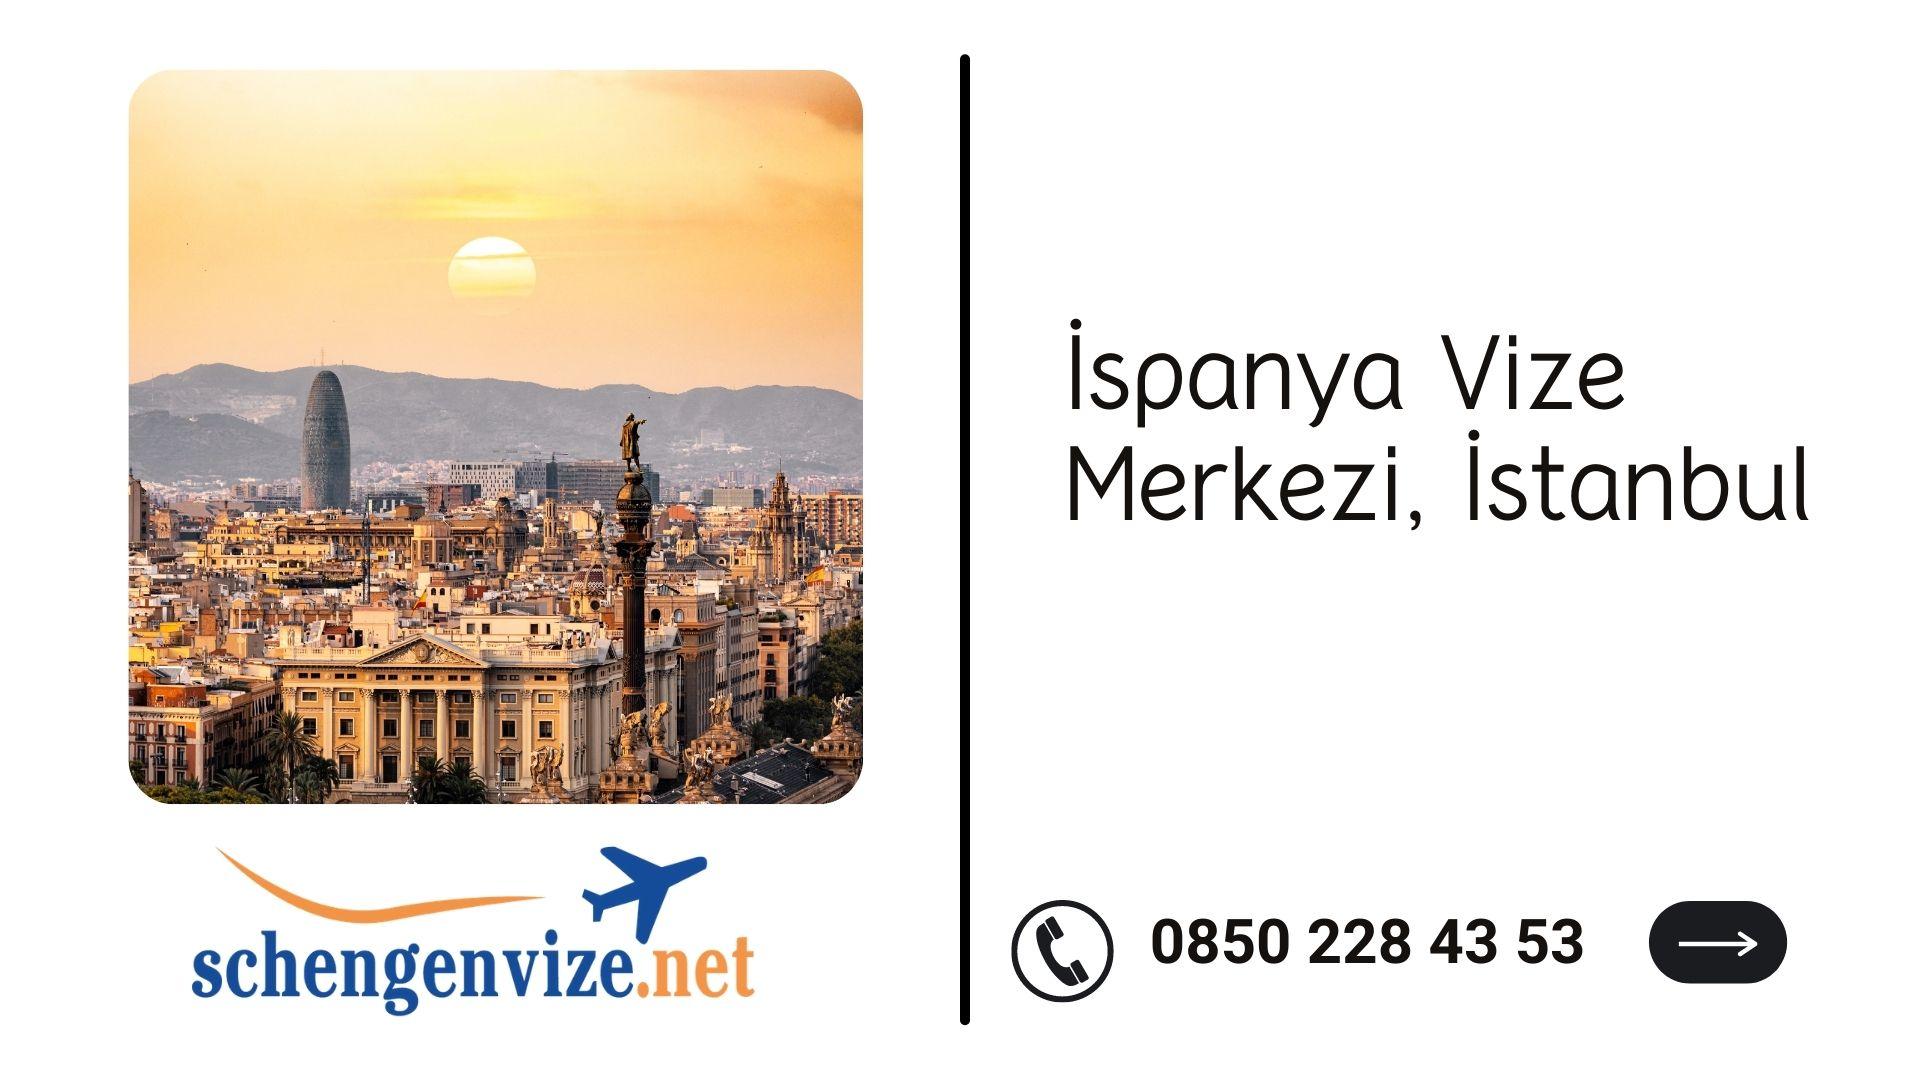 İspanya Vize Merkezi, İstanbul